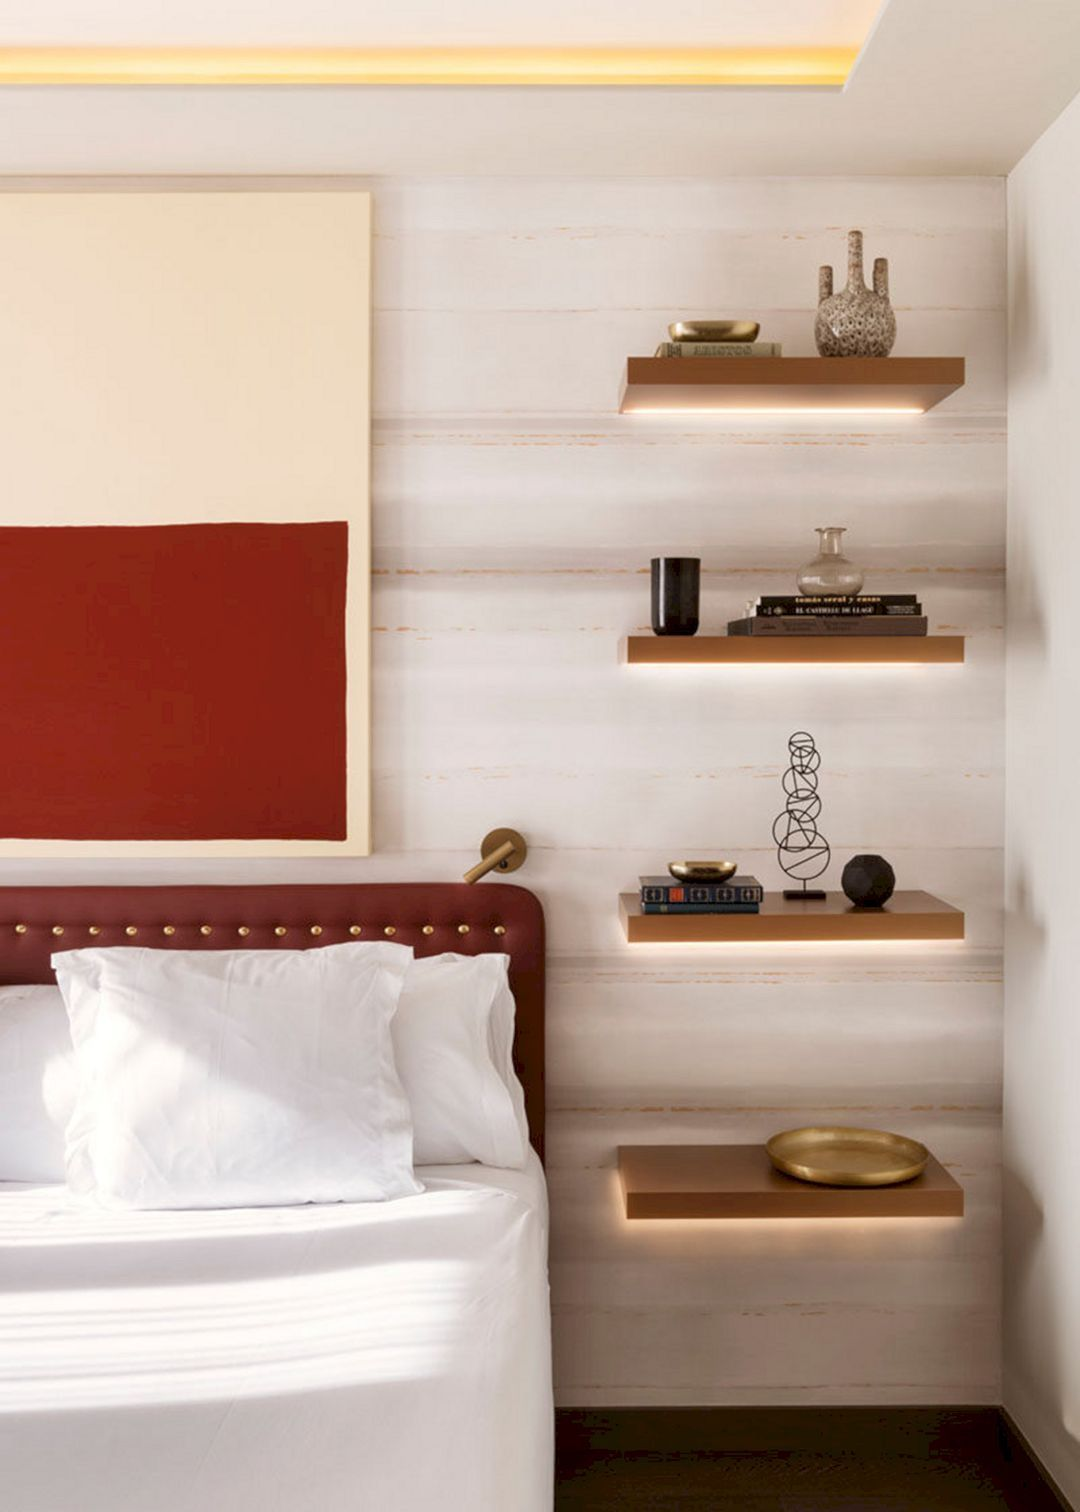 20 Top Hidden Shelving Design Ideas For Bedroom Shelves In